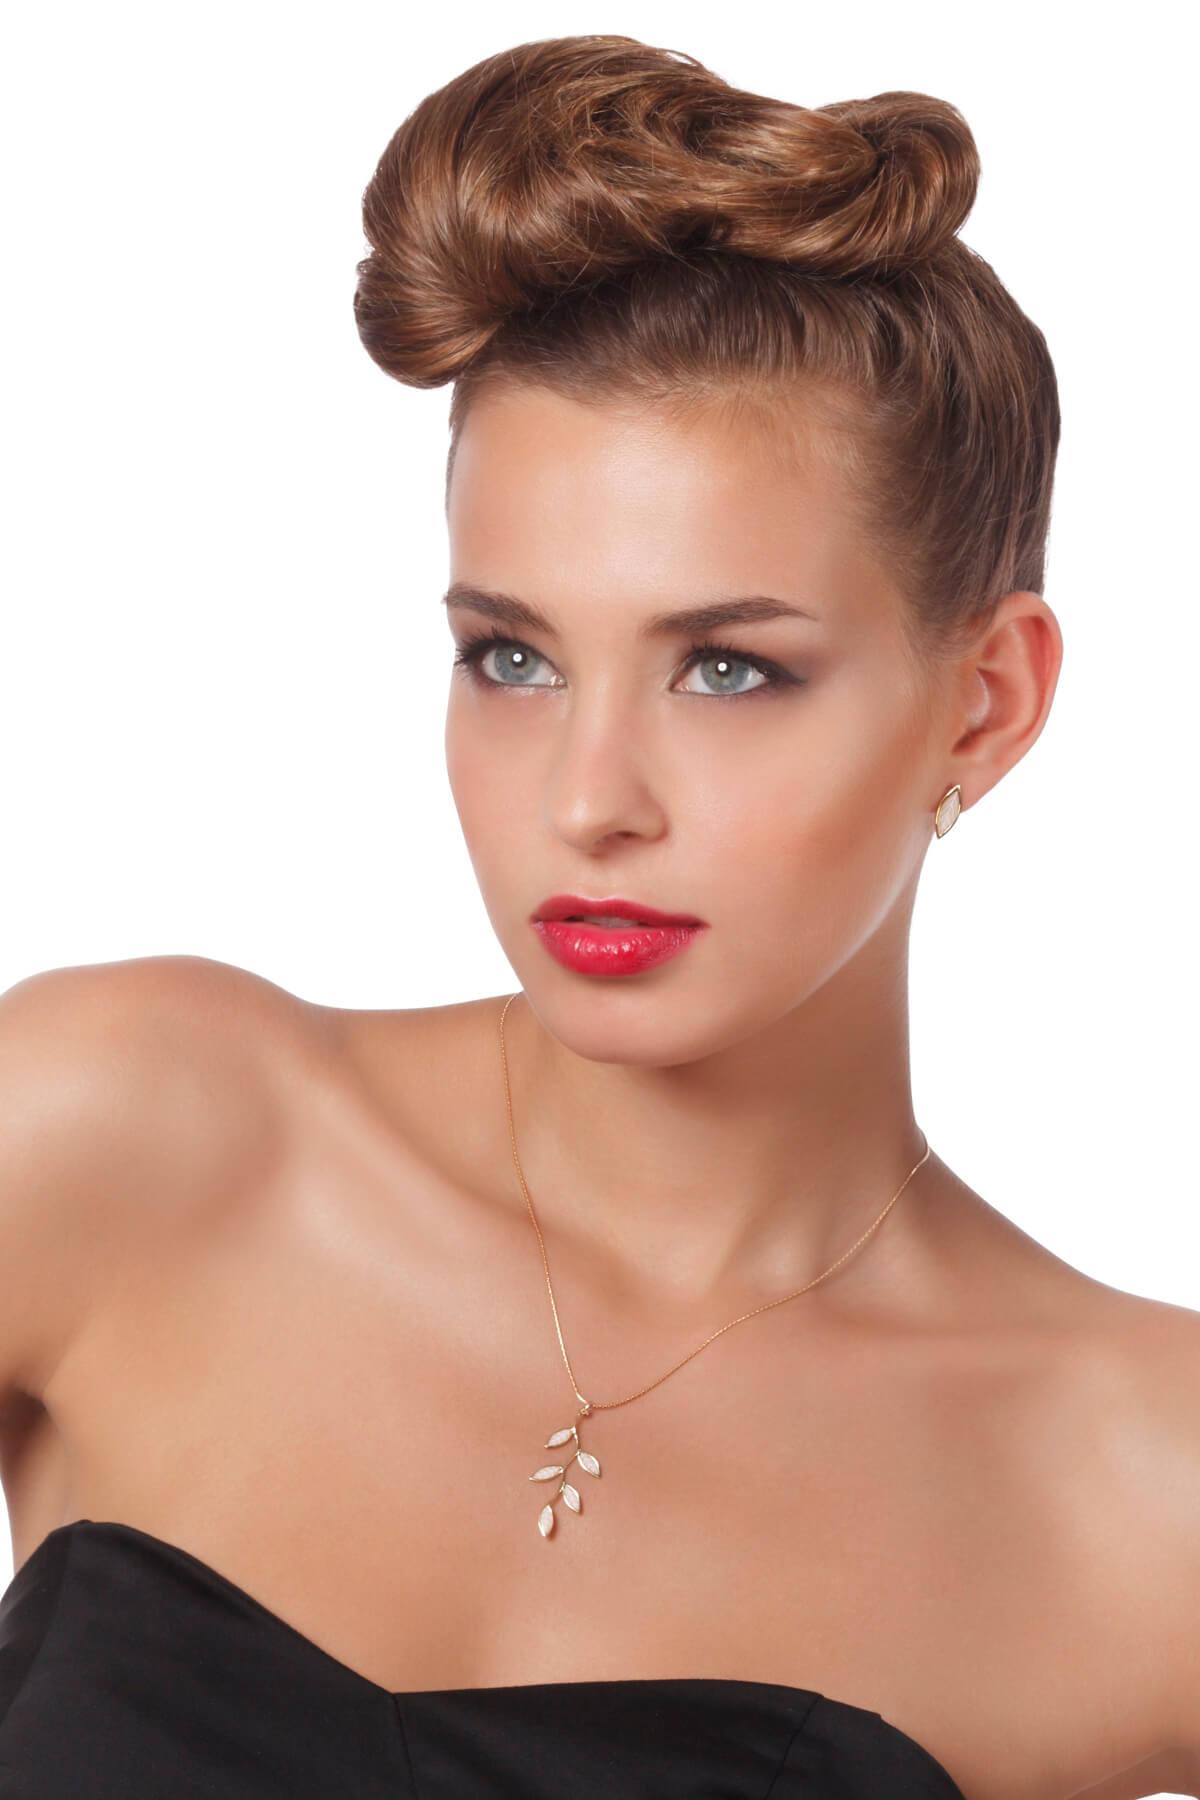 Handmade Vermeil Olive Leaf Stud Earrings and Necklace  – Pearl Pattern